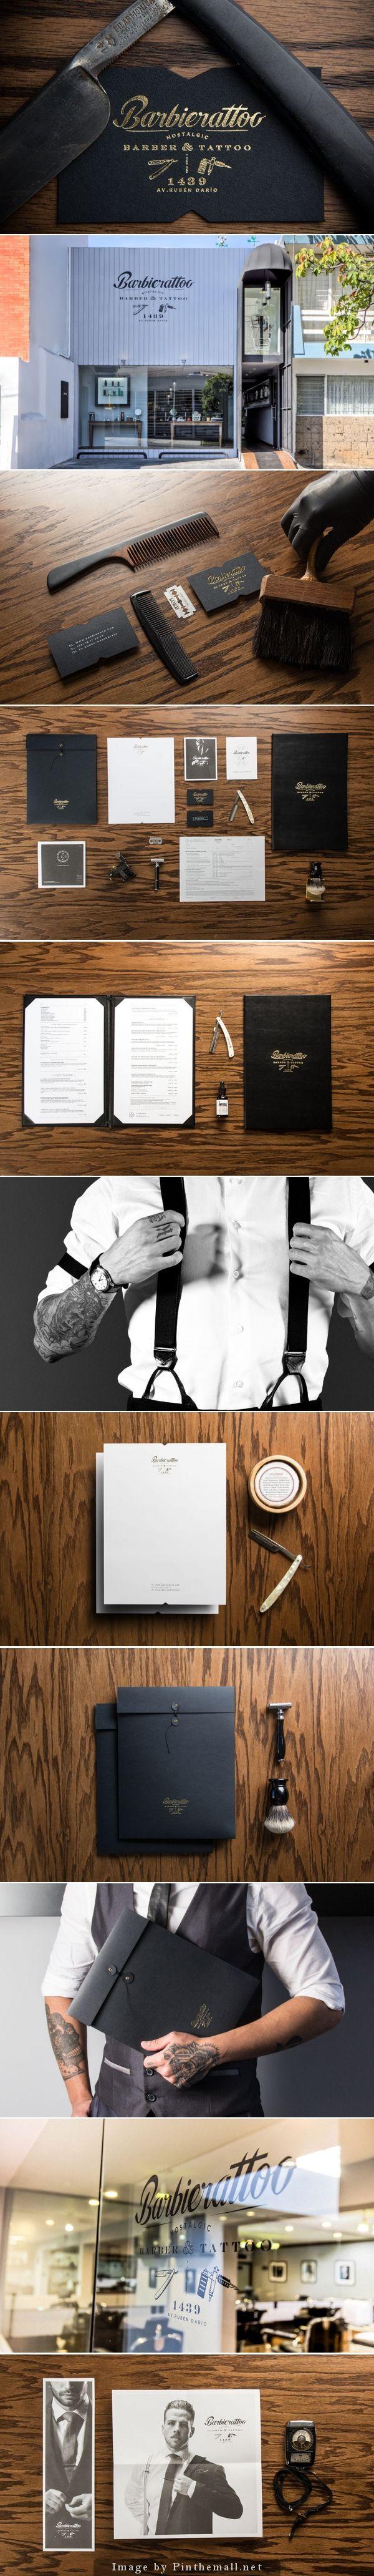 Cool Brand Identity Design. Barber Tattoo Parlor Barbierattoo. #branding #brandidentity [http://www.pinterest.com/alfredchong/]